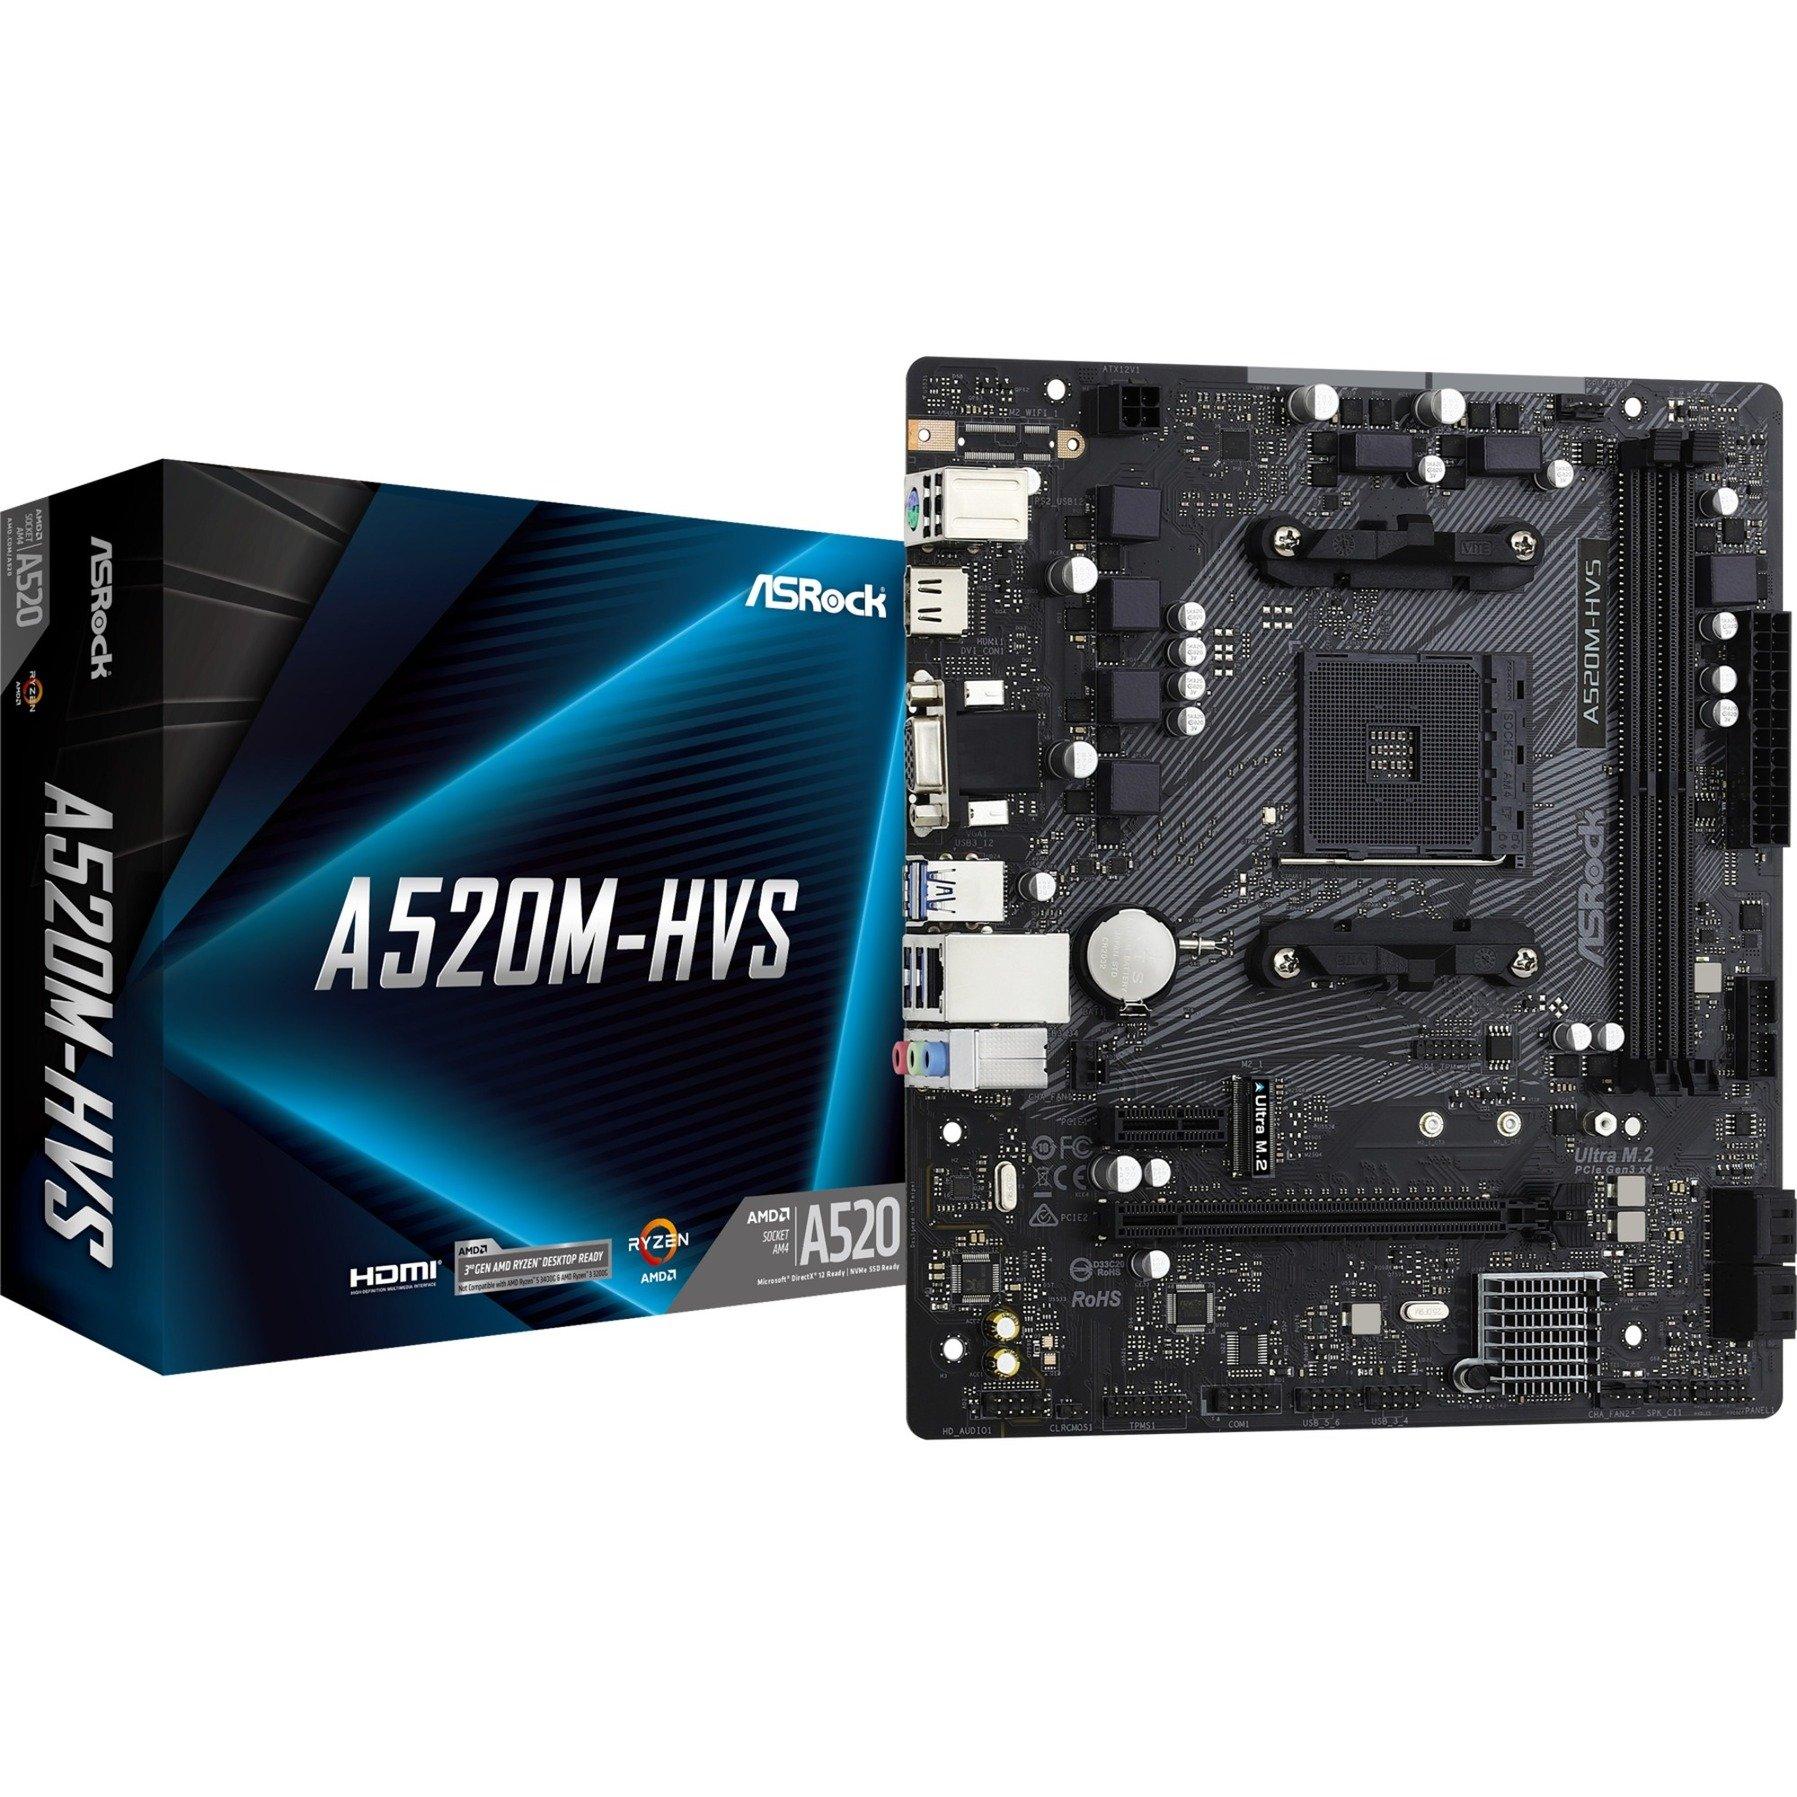 Image of A520M-HVS, Mainboard